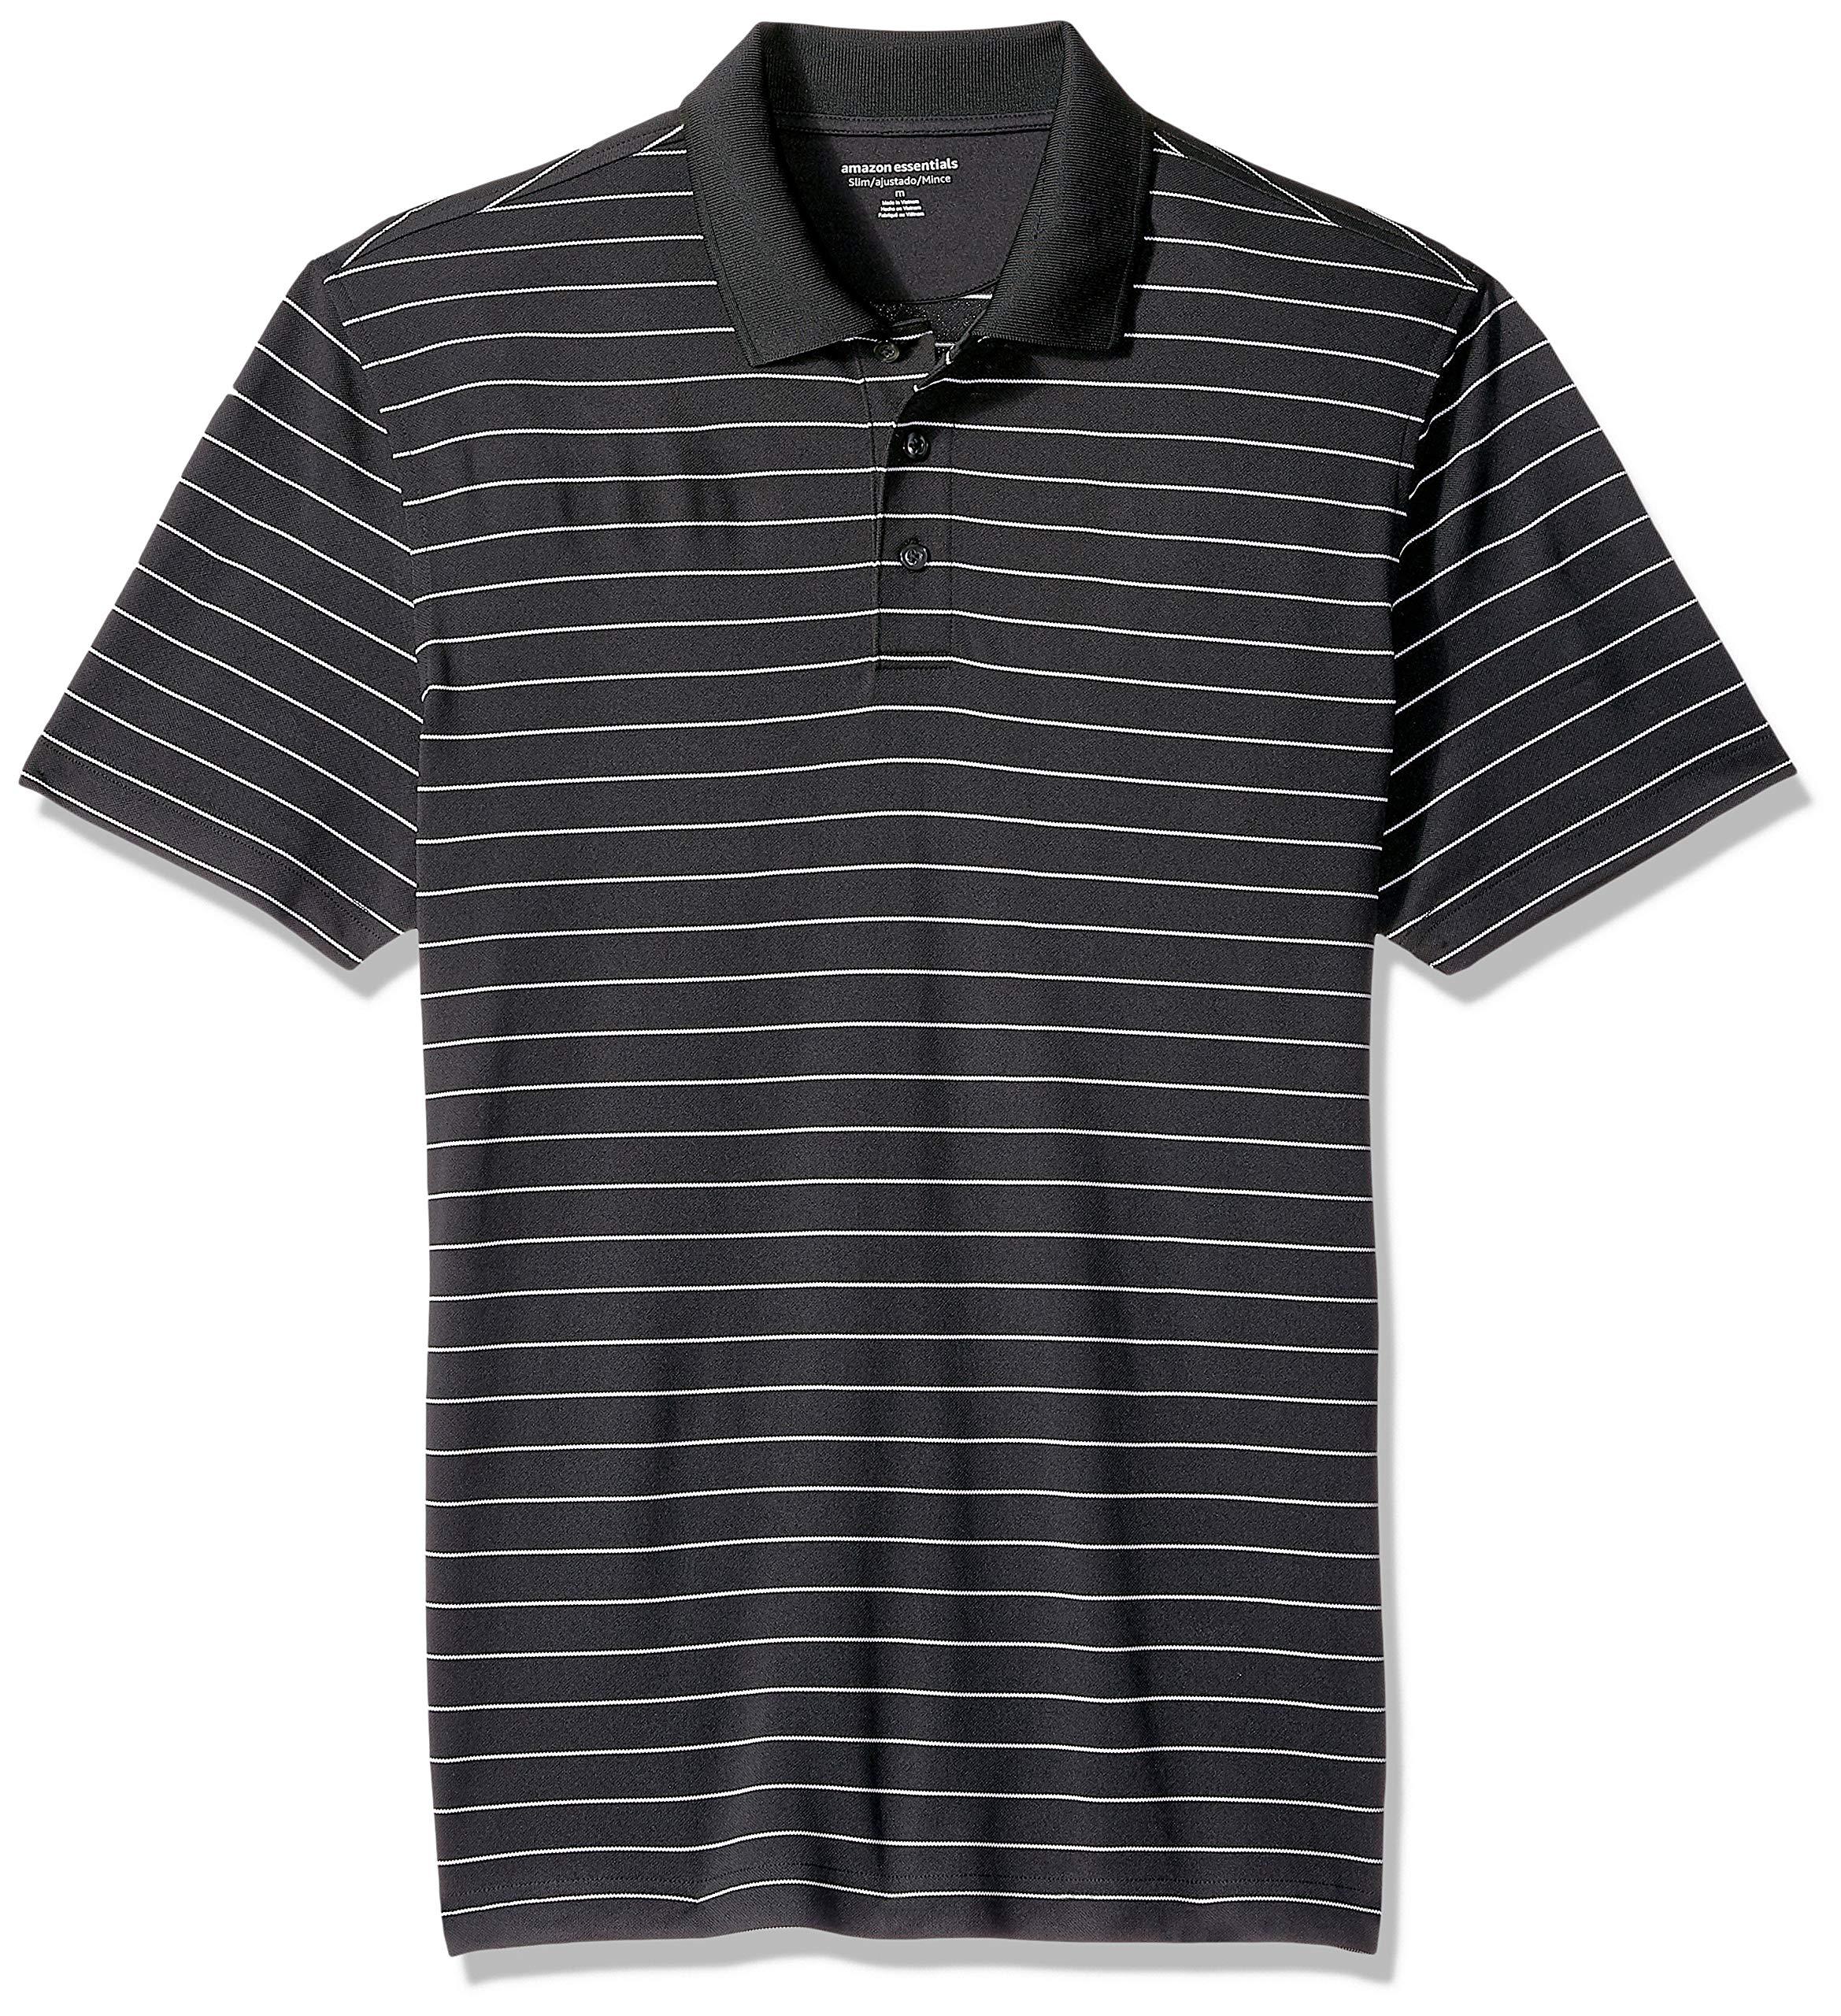 Amazon Essentials Men's Slim-Fit Quick-Dry Golf Polo Shirt, Black Stripe, X-Small